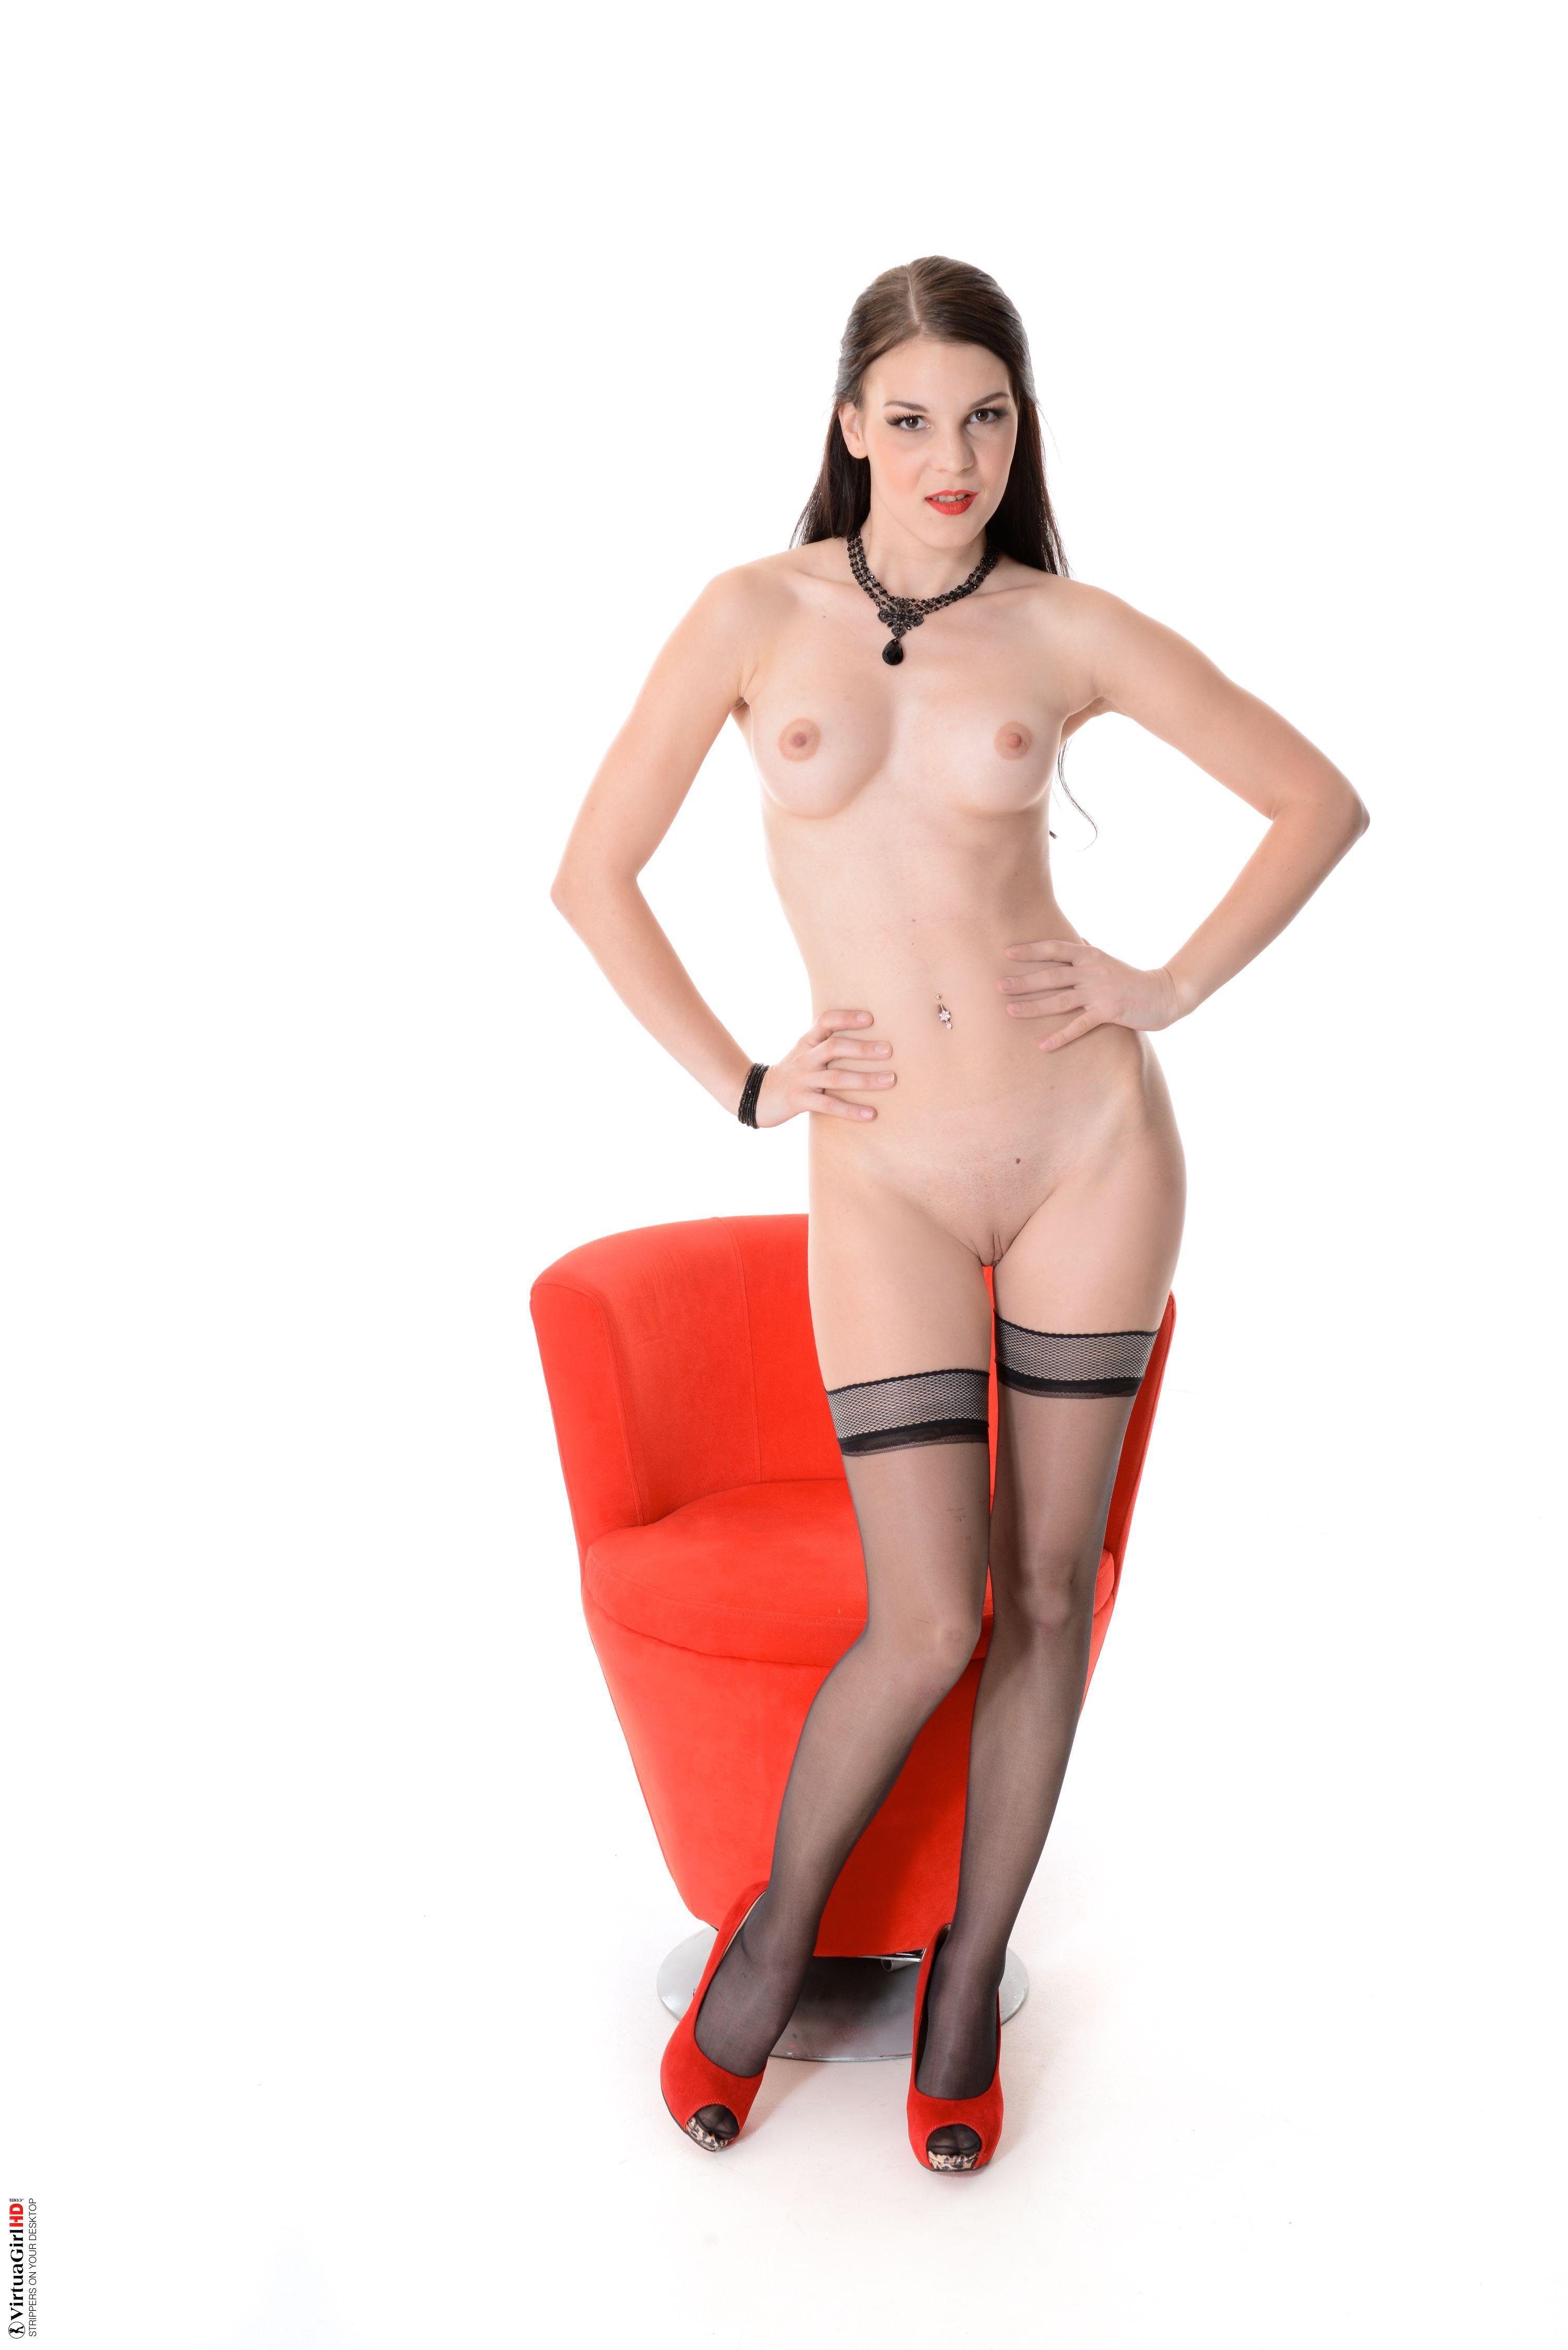 girls stripping for man